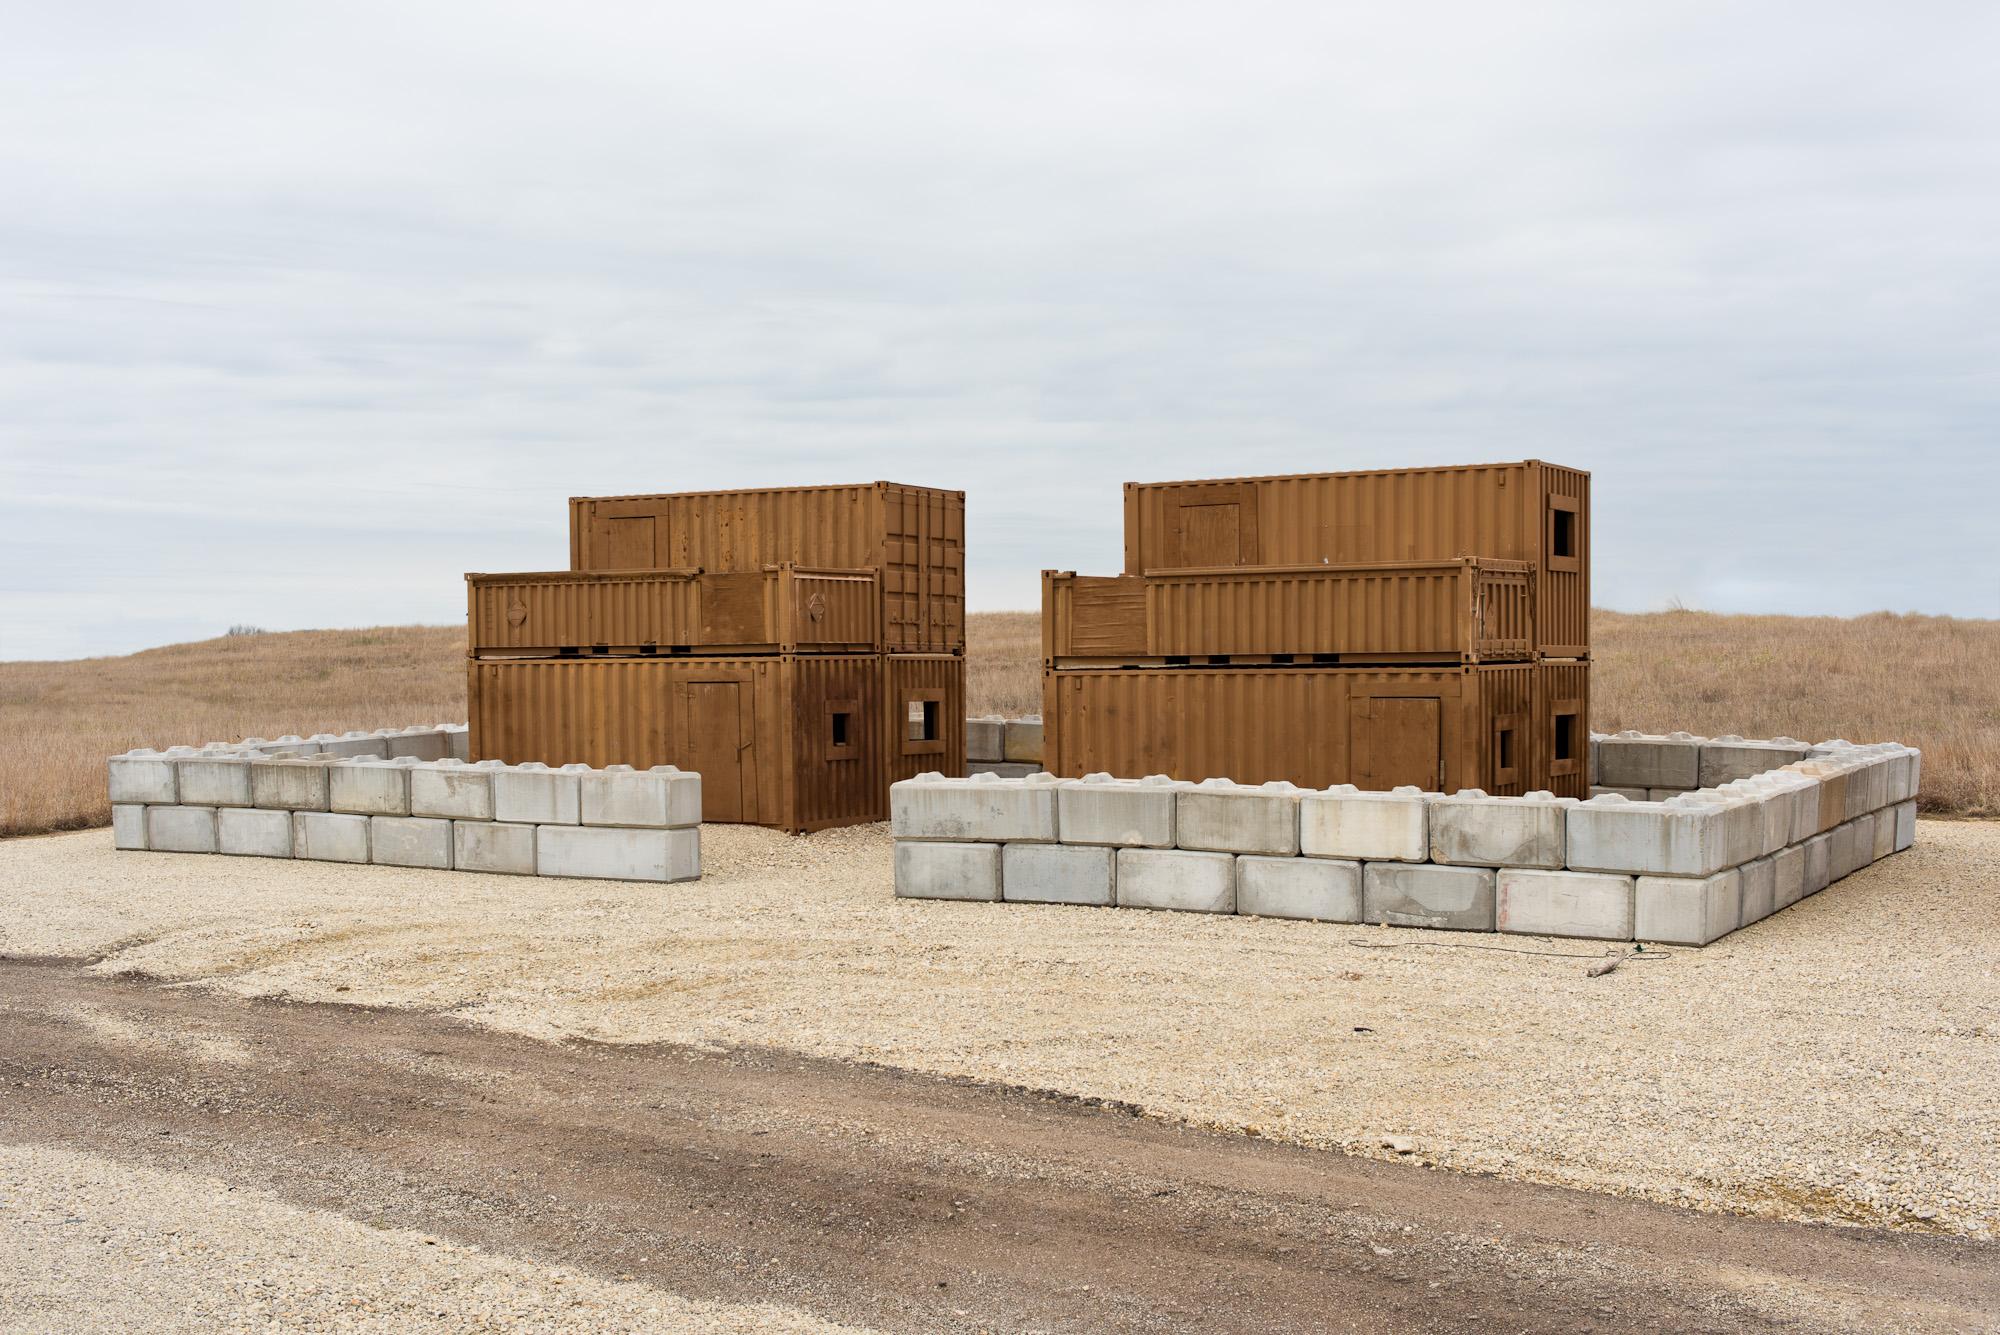 11. Isolated Neighbors, Live Fire Village #4, Fort Riley, KS